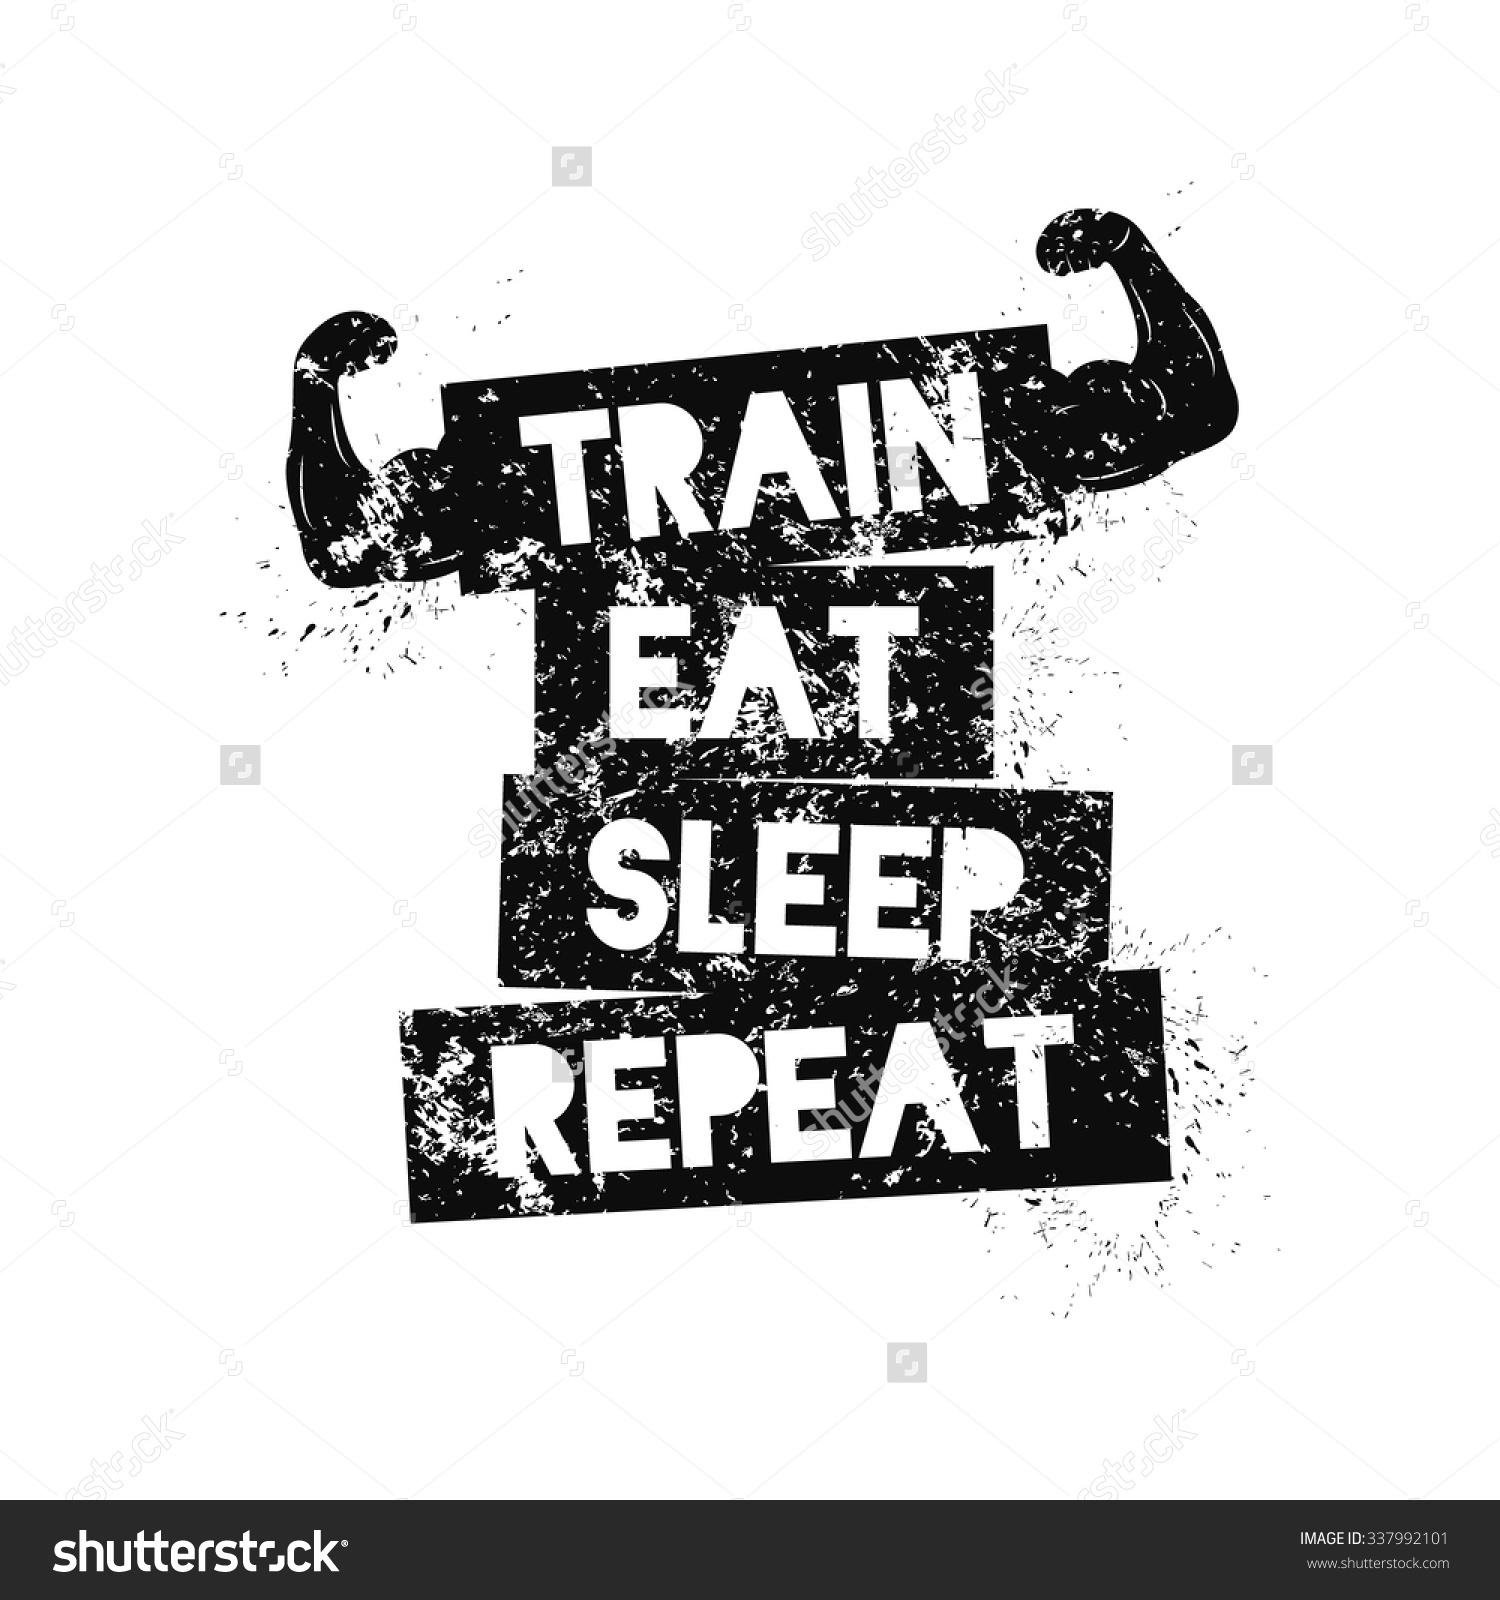 Train Eat Sleep Repeat Motivational Quote Stock Vector 337992101.